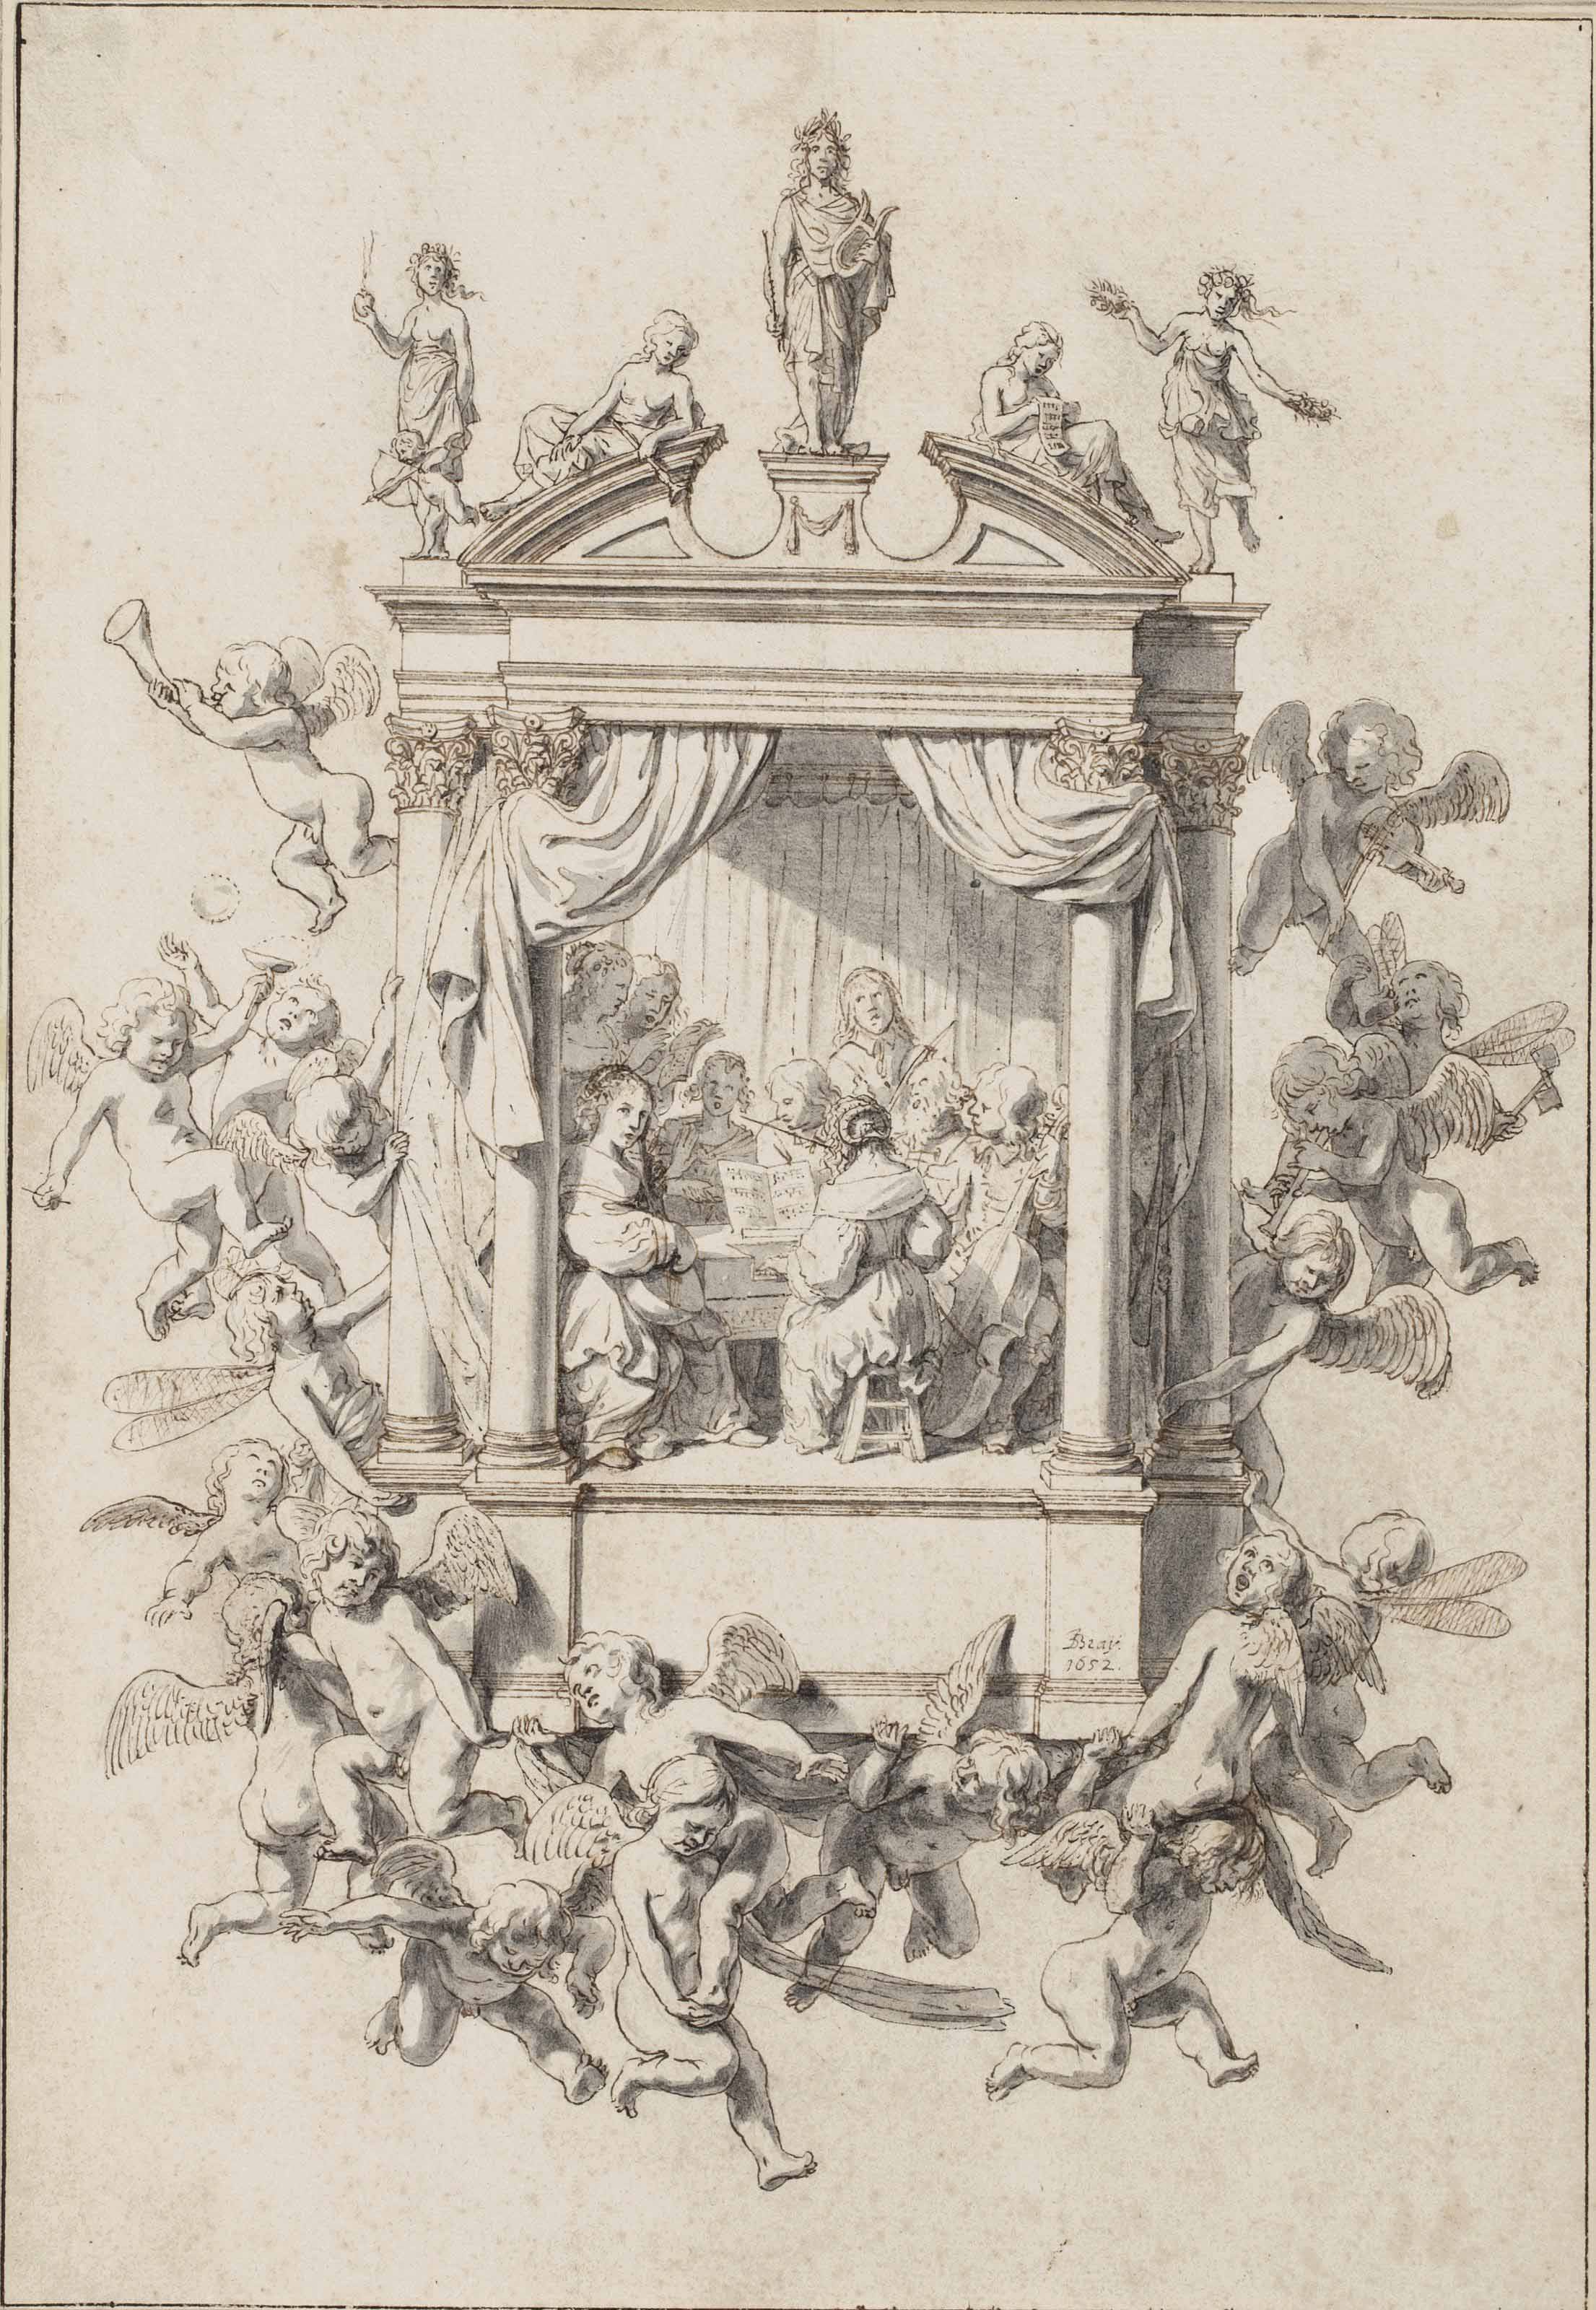 Jan de Bray (Haarlem 1627-1697 Amsterdam)